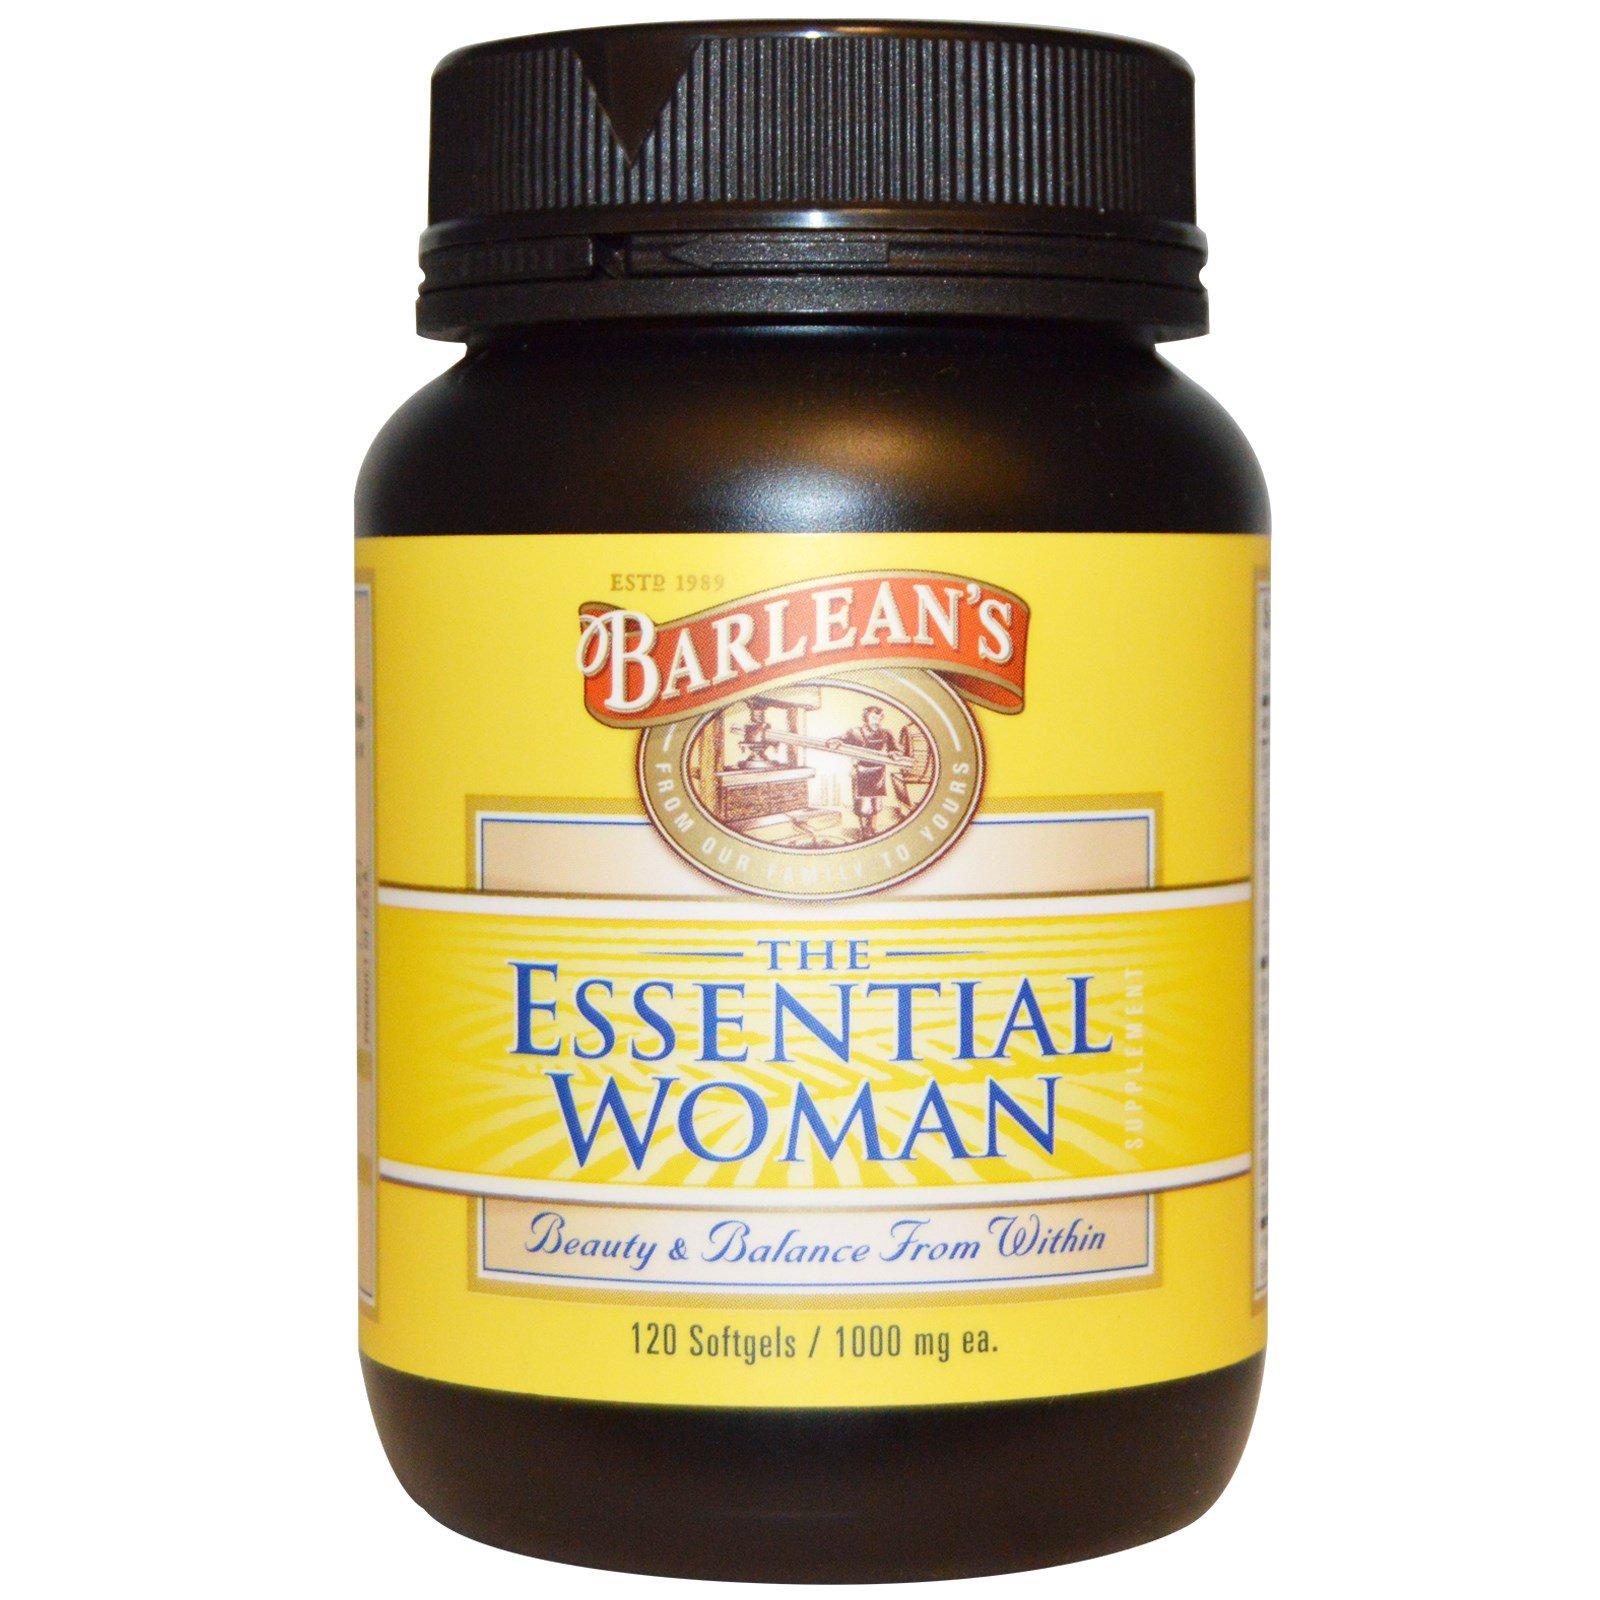 Barlean's, The Essential Woman (добавка для женщин), 1000 мг, 120 желатиновых капсул